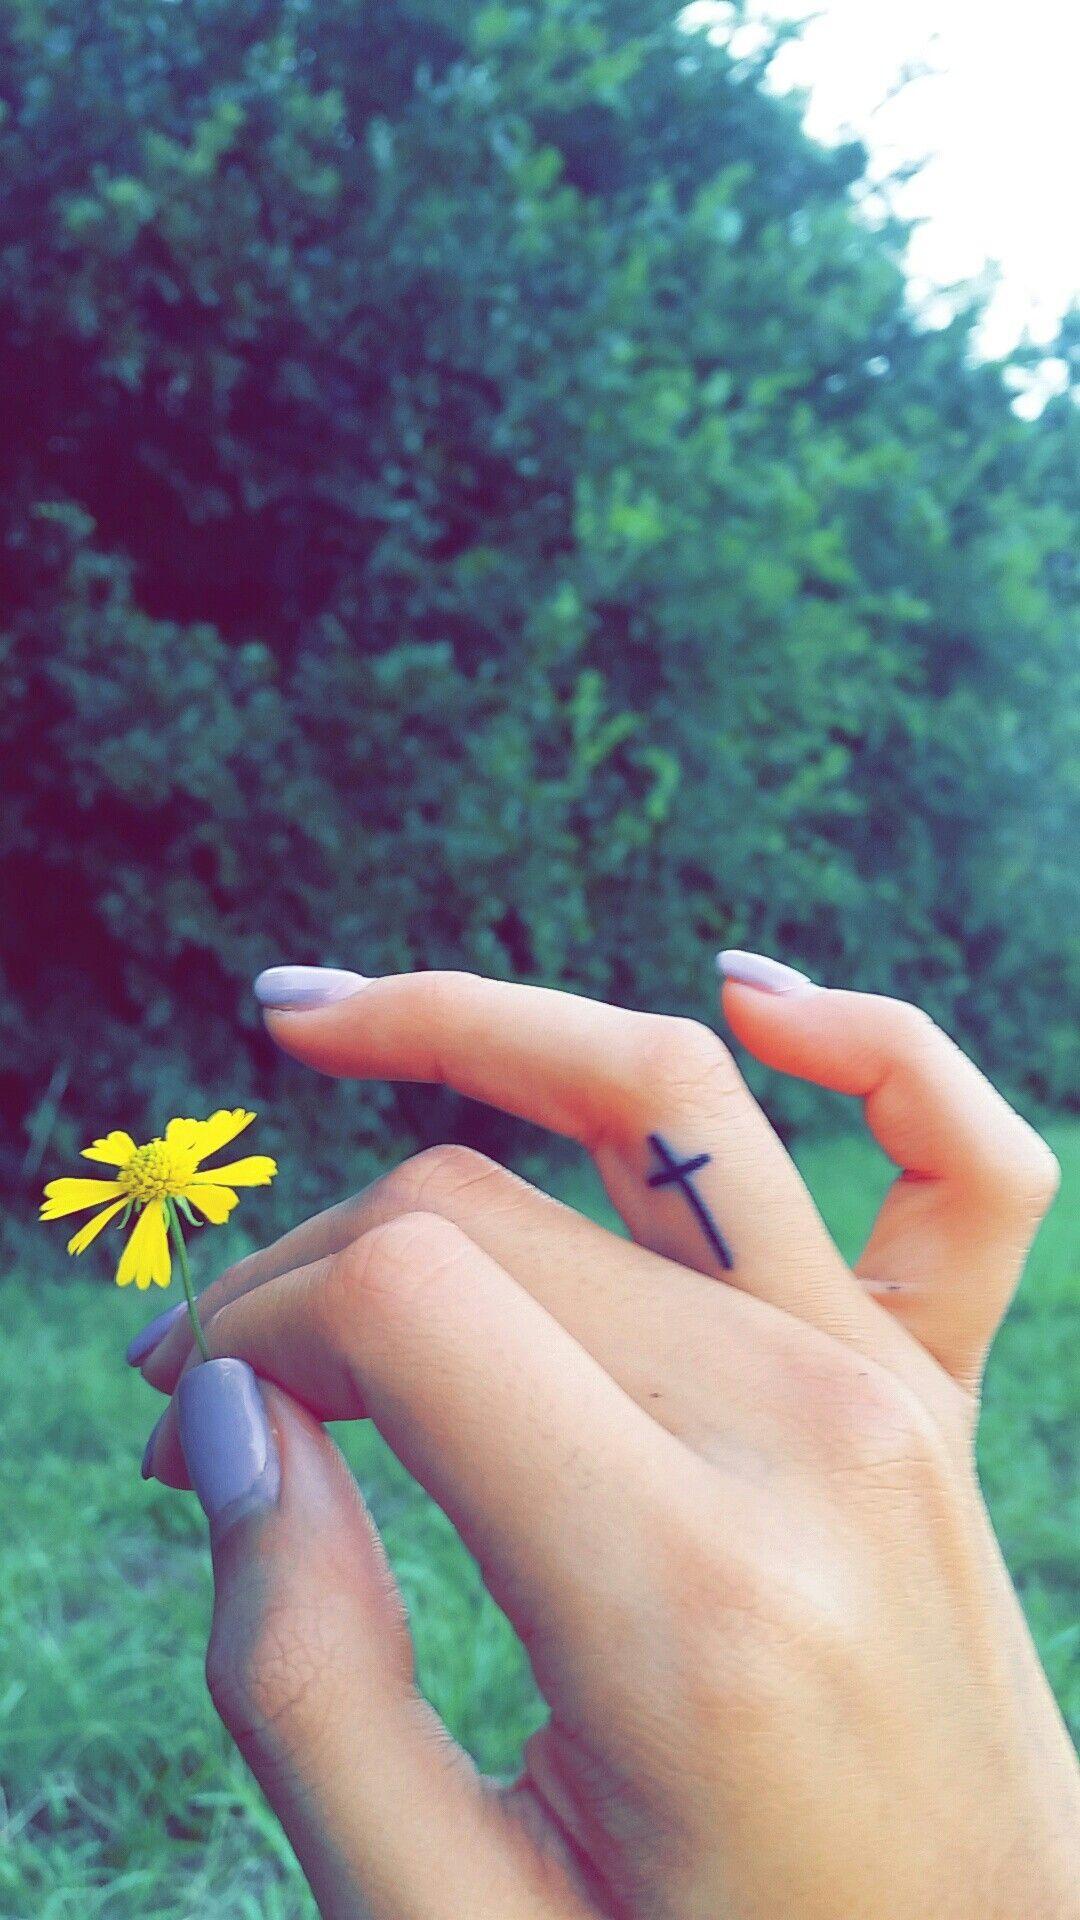 Pin By Chelsea Nelson On Derma Tatouage Tattoo Doigts Tatouage Femme